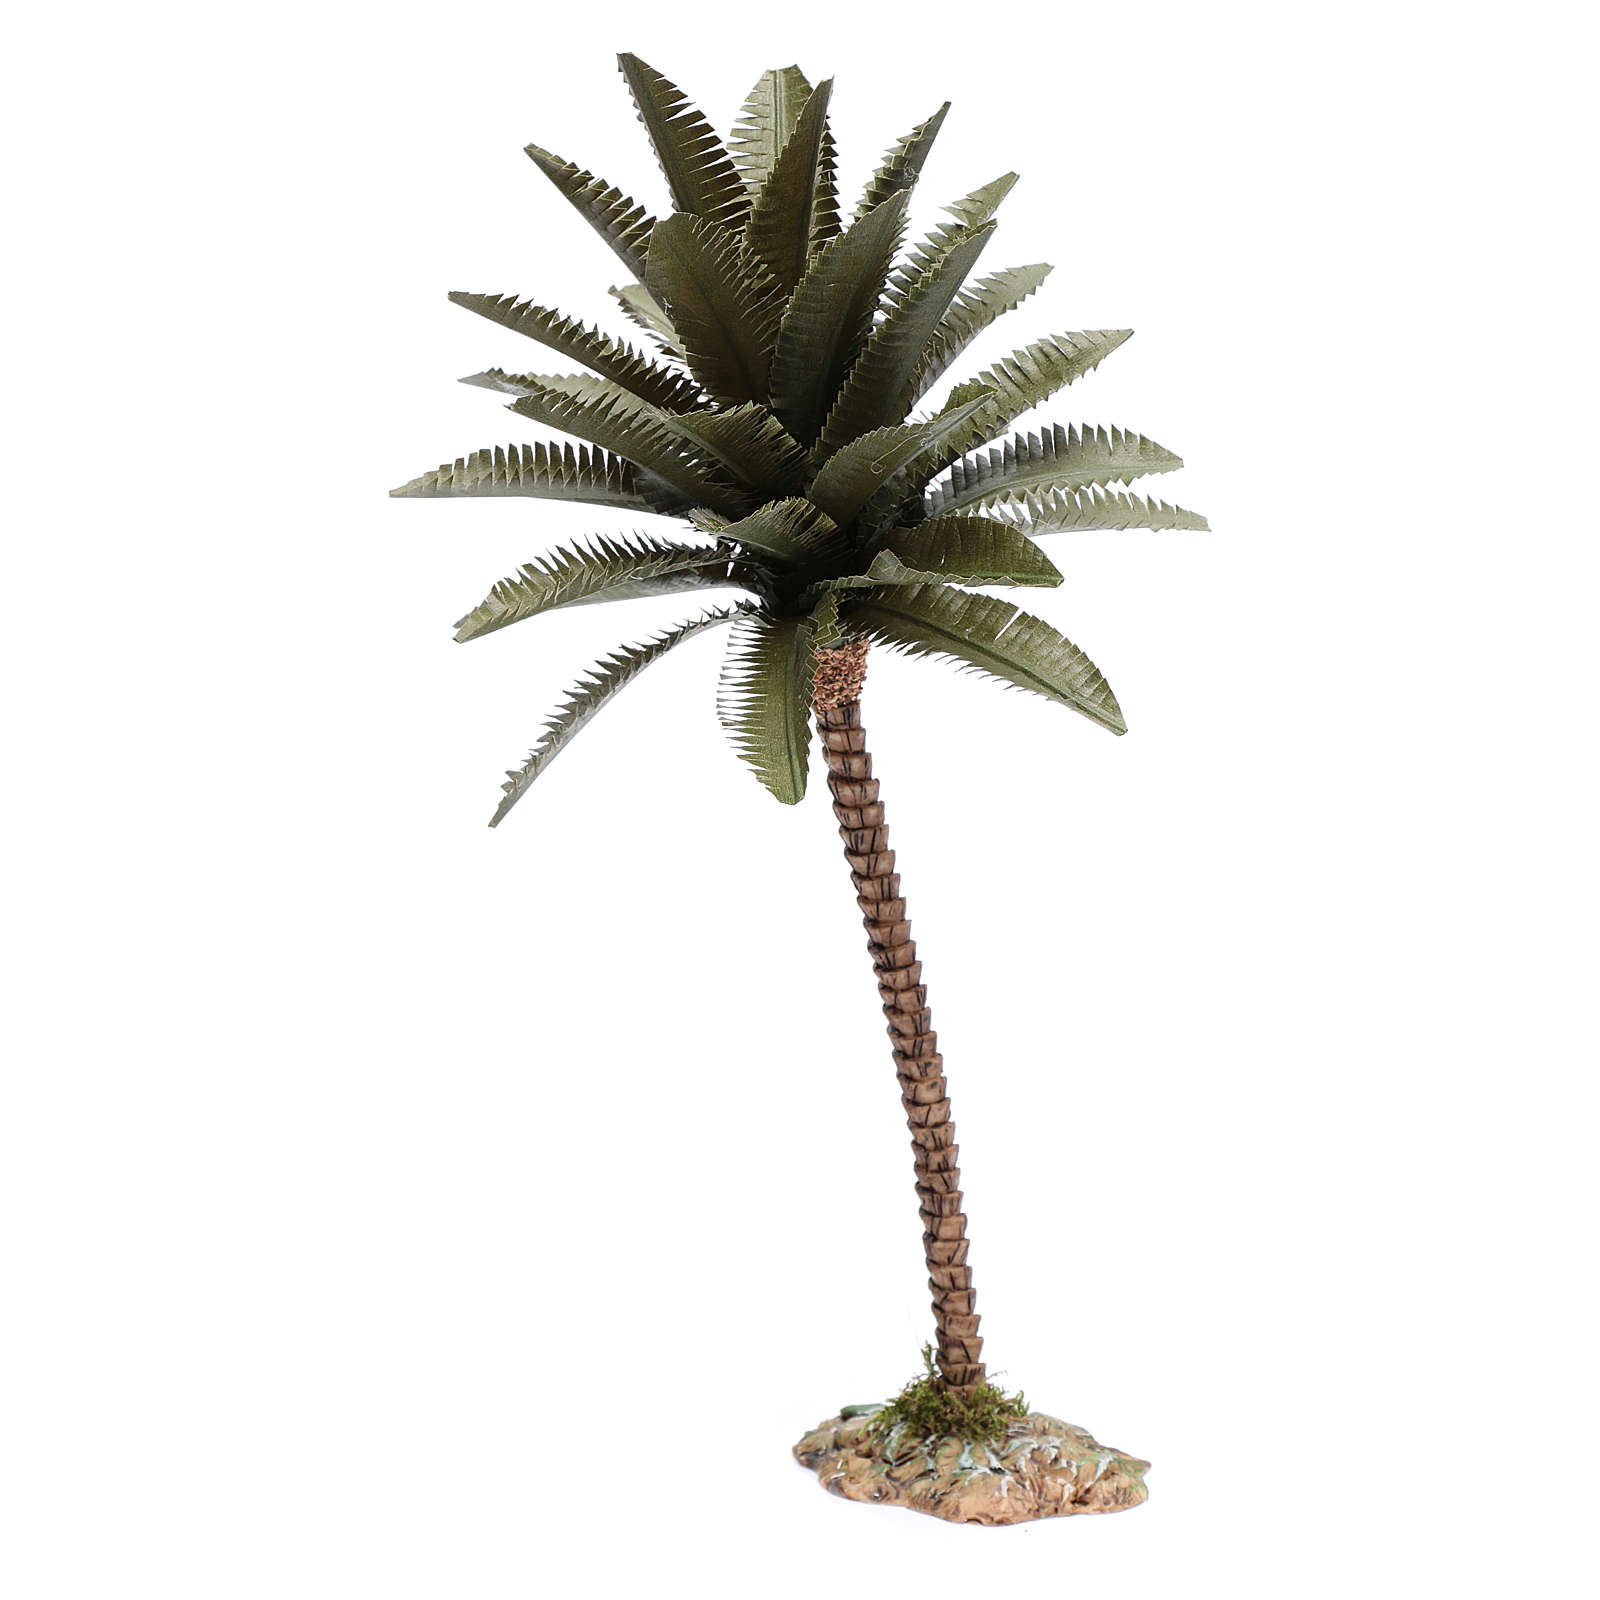 Palma resina para belén hecho con bricolaje 25 cm de altura media 4